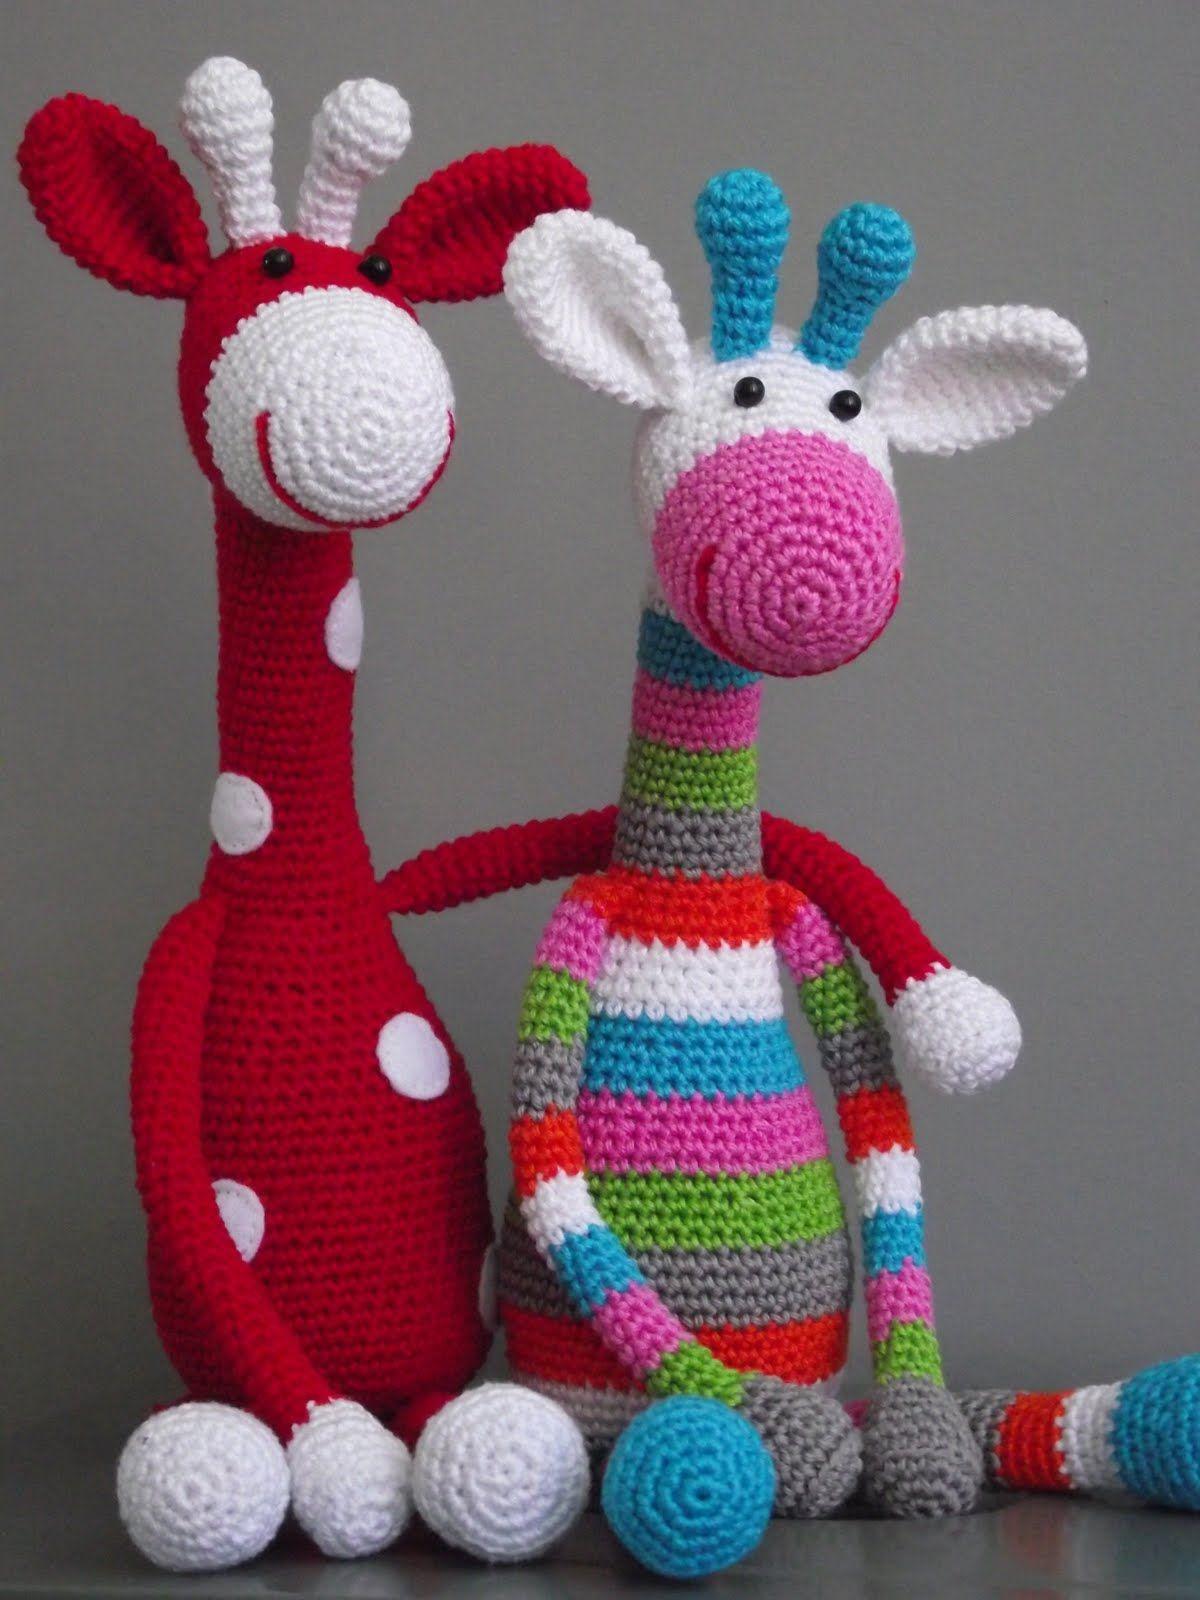 Crochet Giraffe The Cutest Ideas Ever | Ganchillo, Jirafa y Tejido